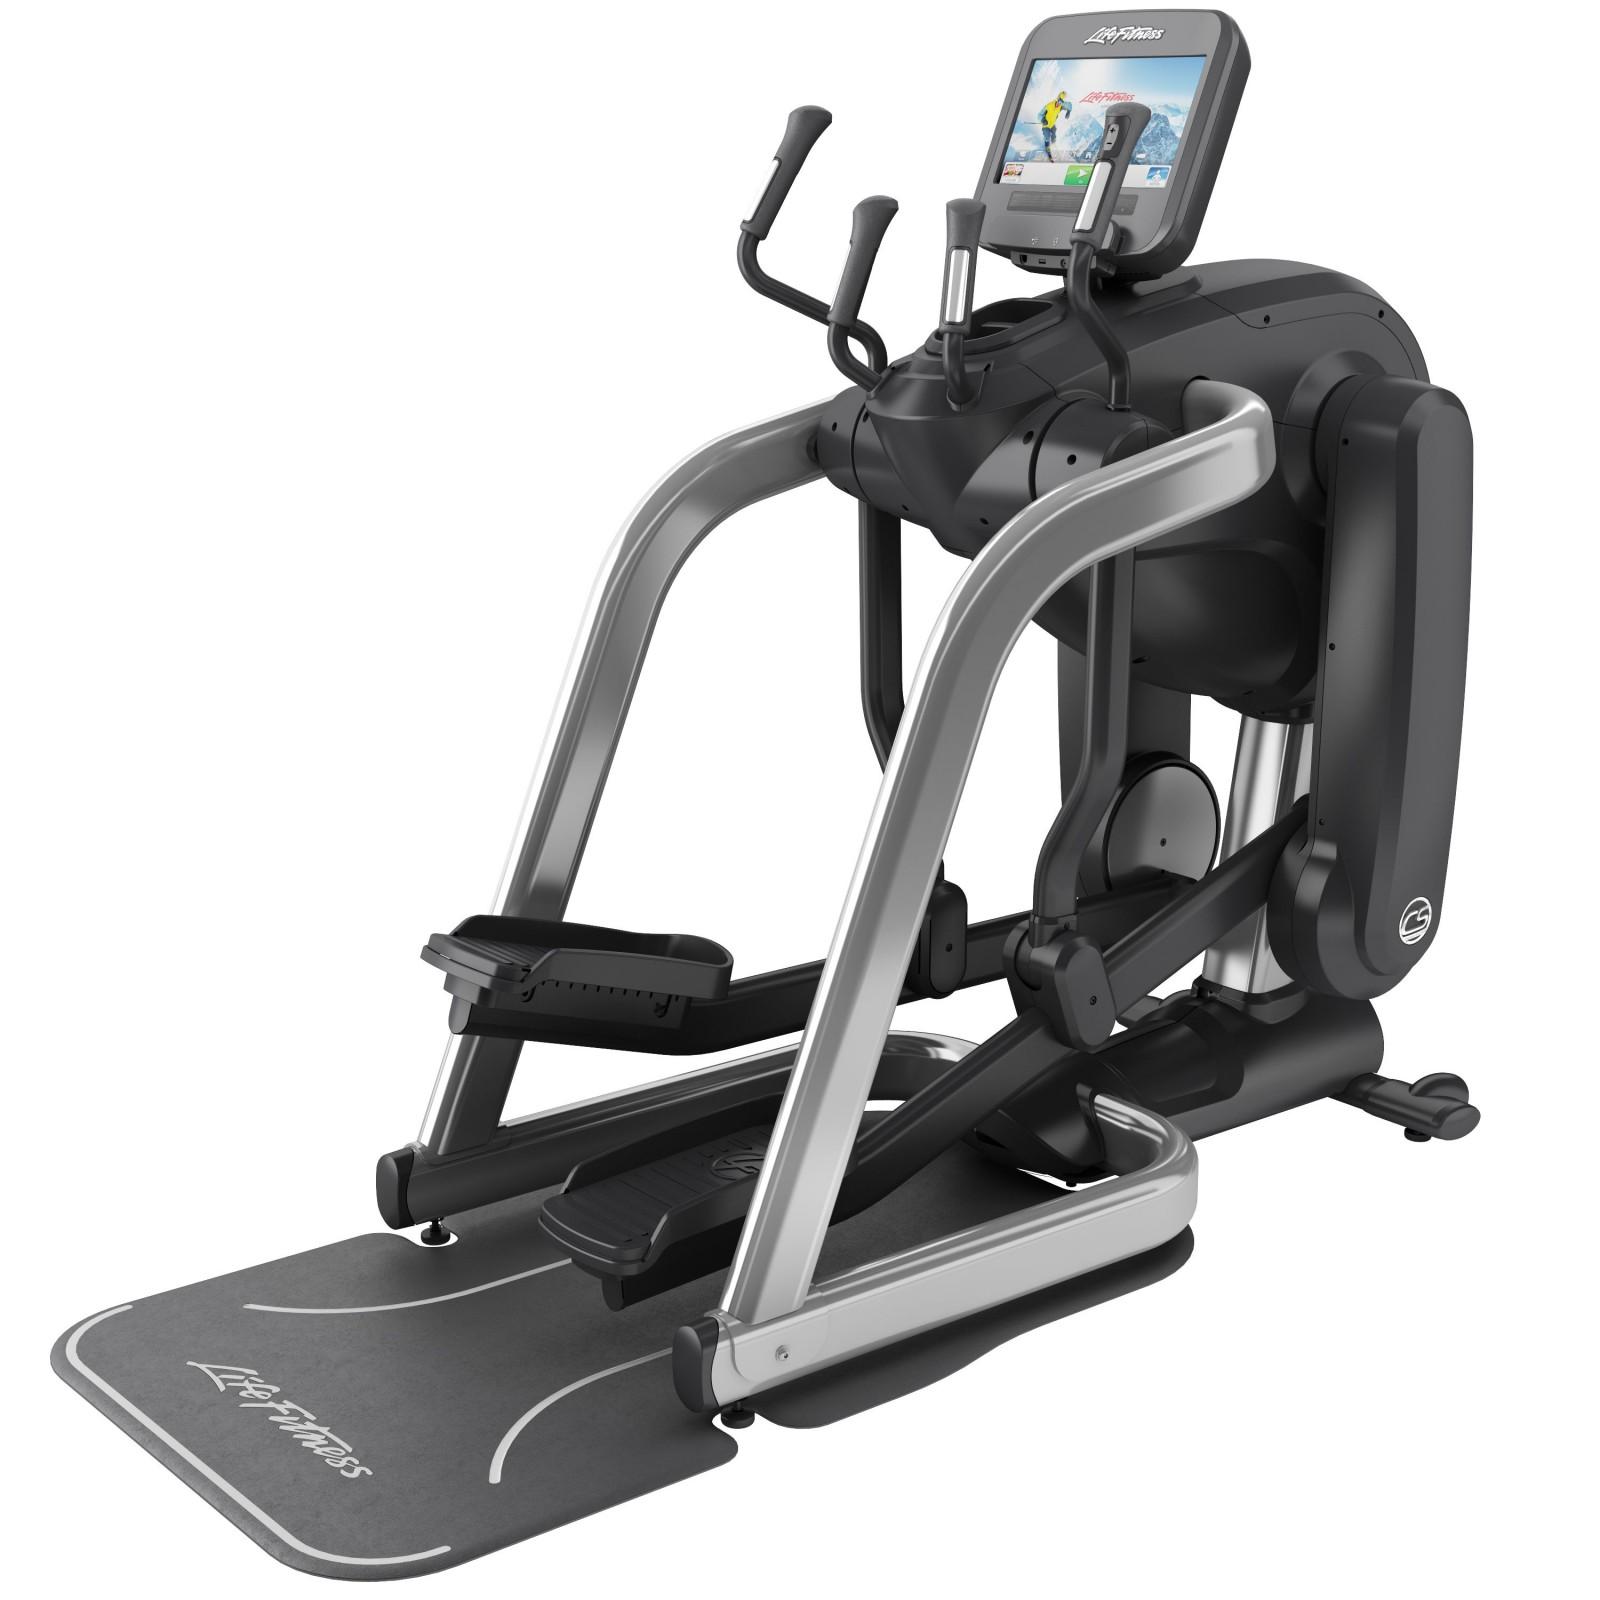 life fitness crosstrainer platinum club series discover se. Black Bedroom Furniture Sets. Home Design Ideas